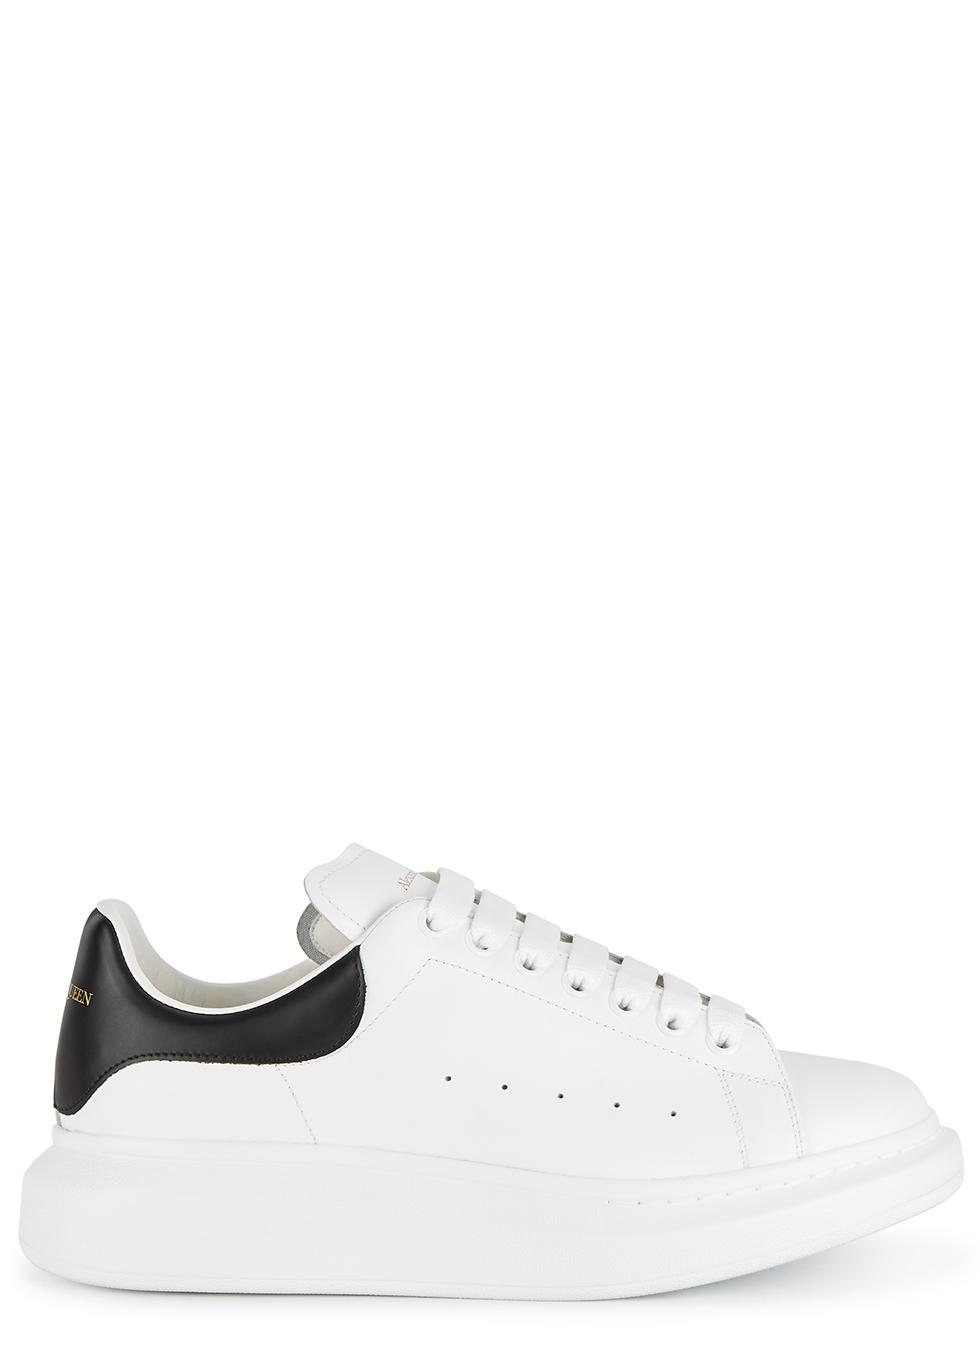 Men's Designer Shoes - Men's Footwear